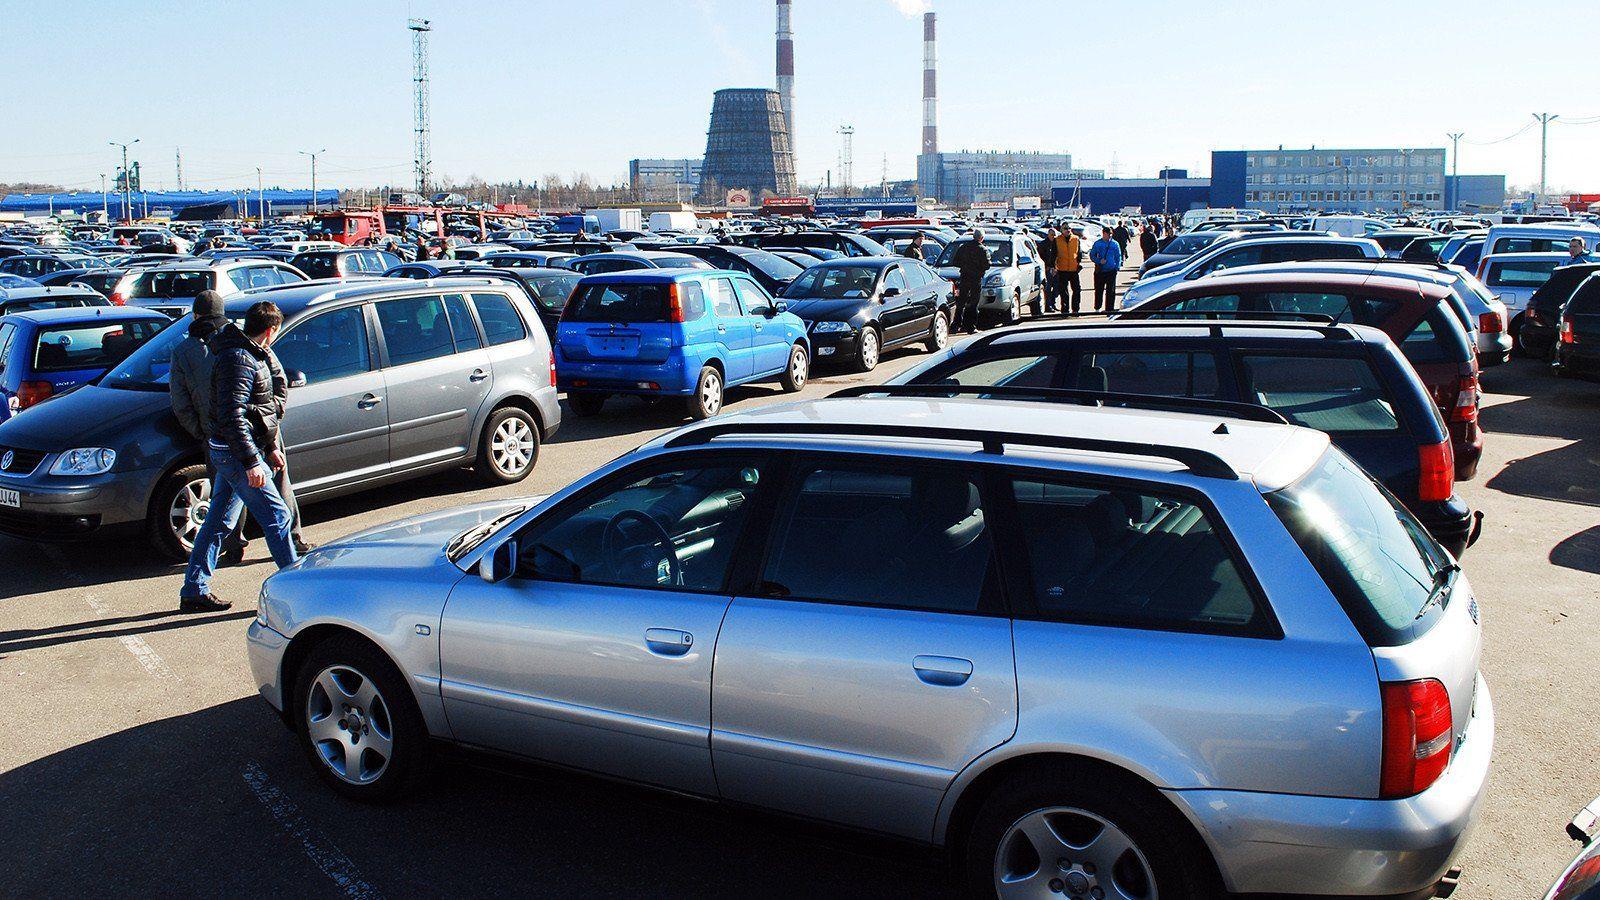 ВБашкирии рынок вырос на26,4%